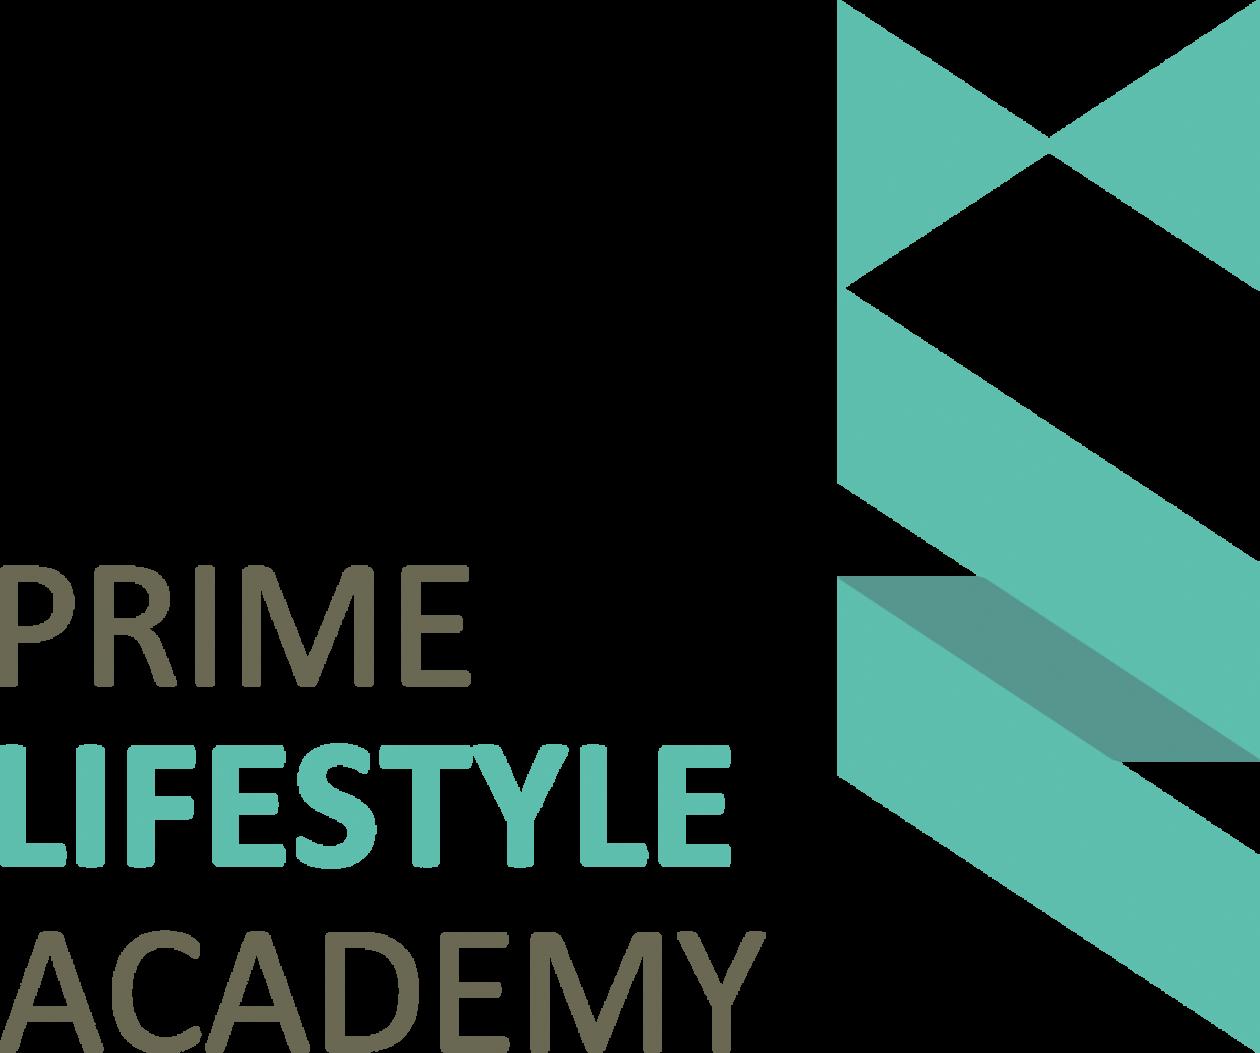 Prime Lifestyle Academy